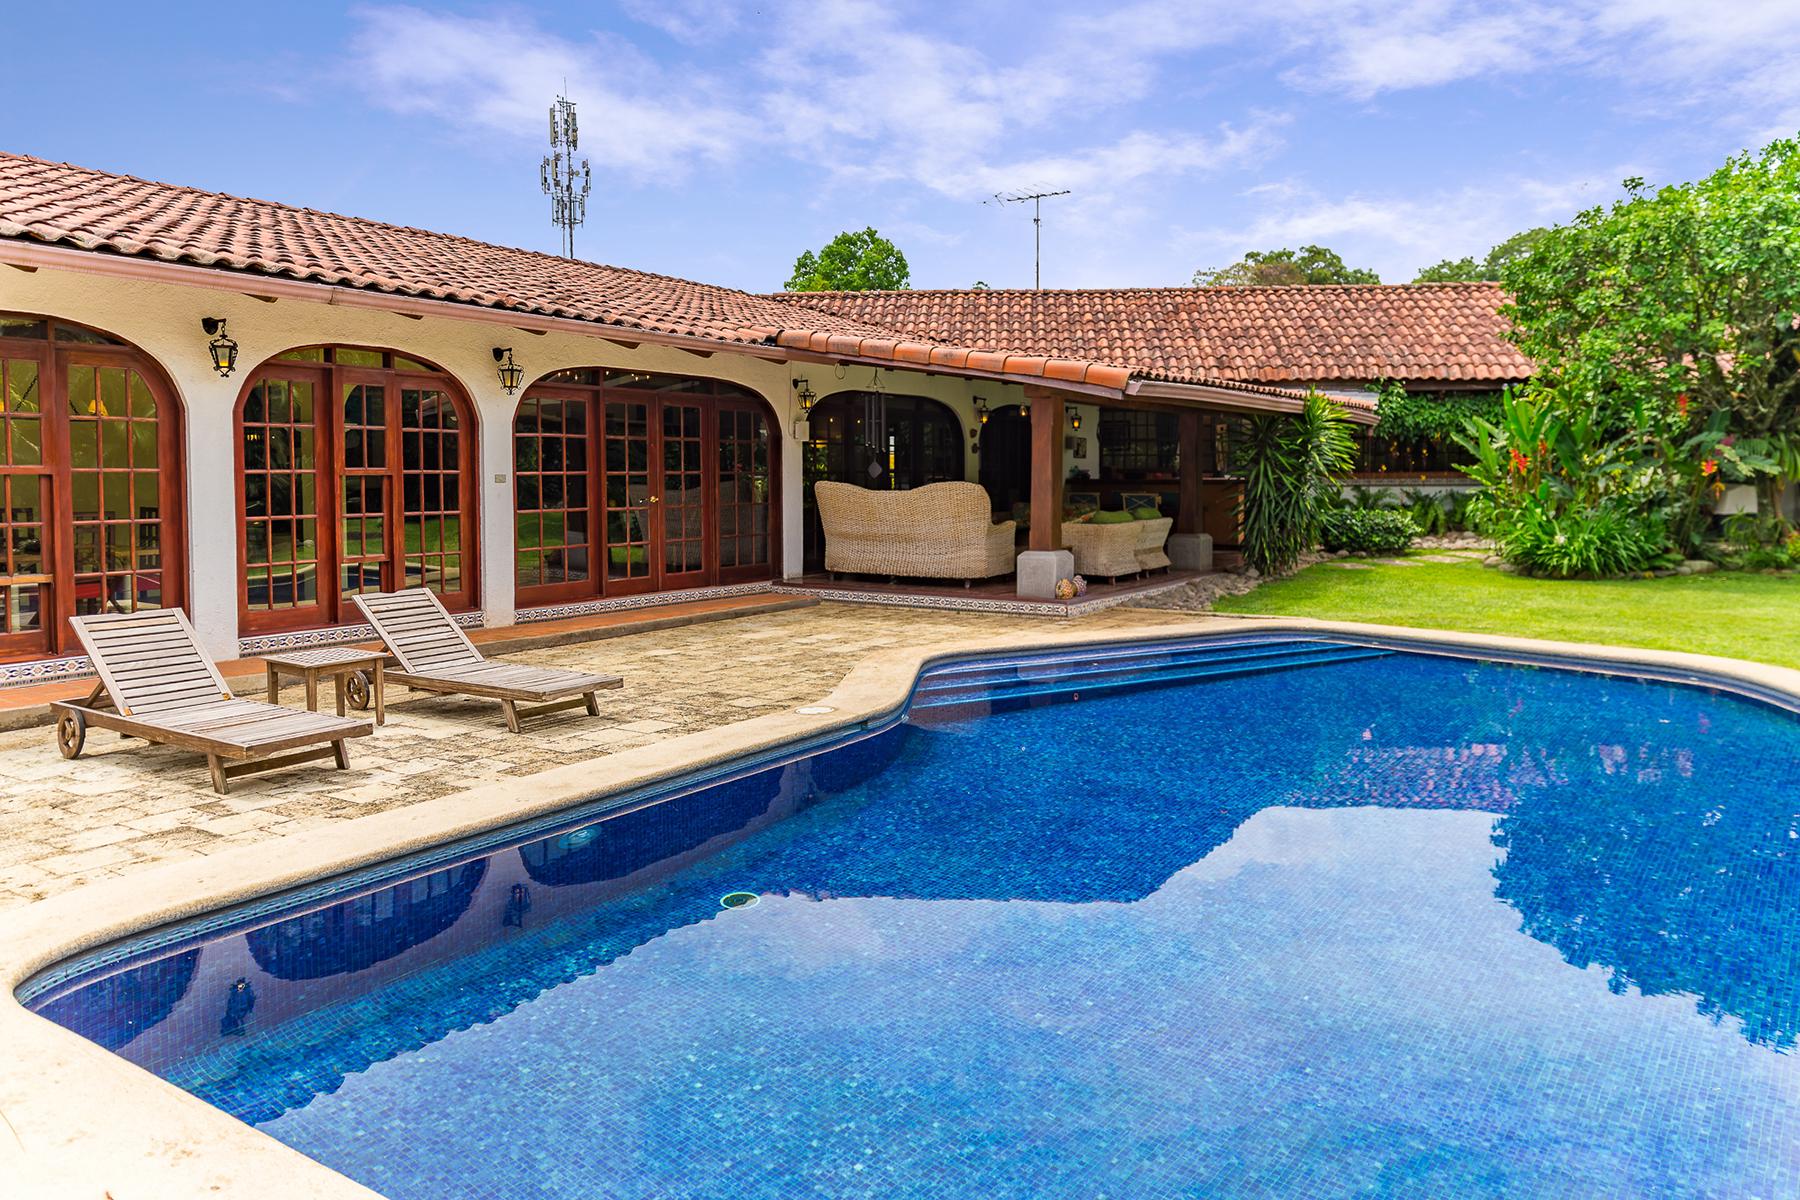 Single Family Homes for Sale at Casa Zula Escazu, San Jose Costa Rica